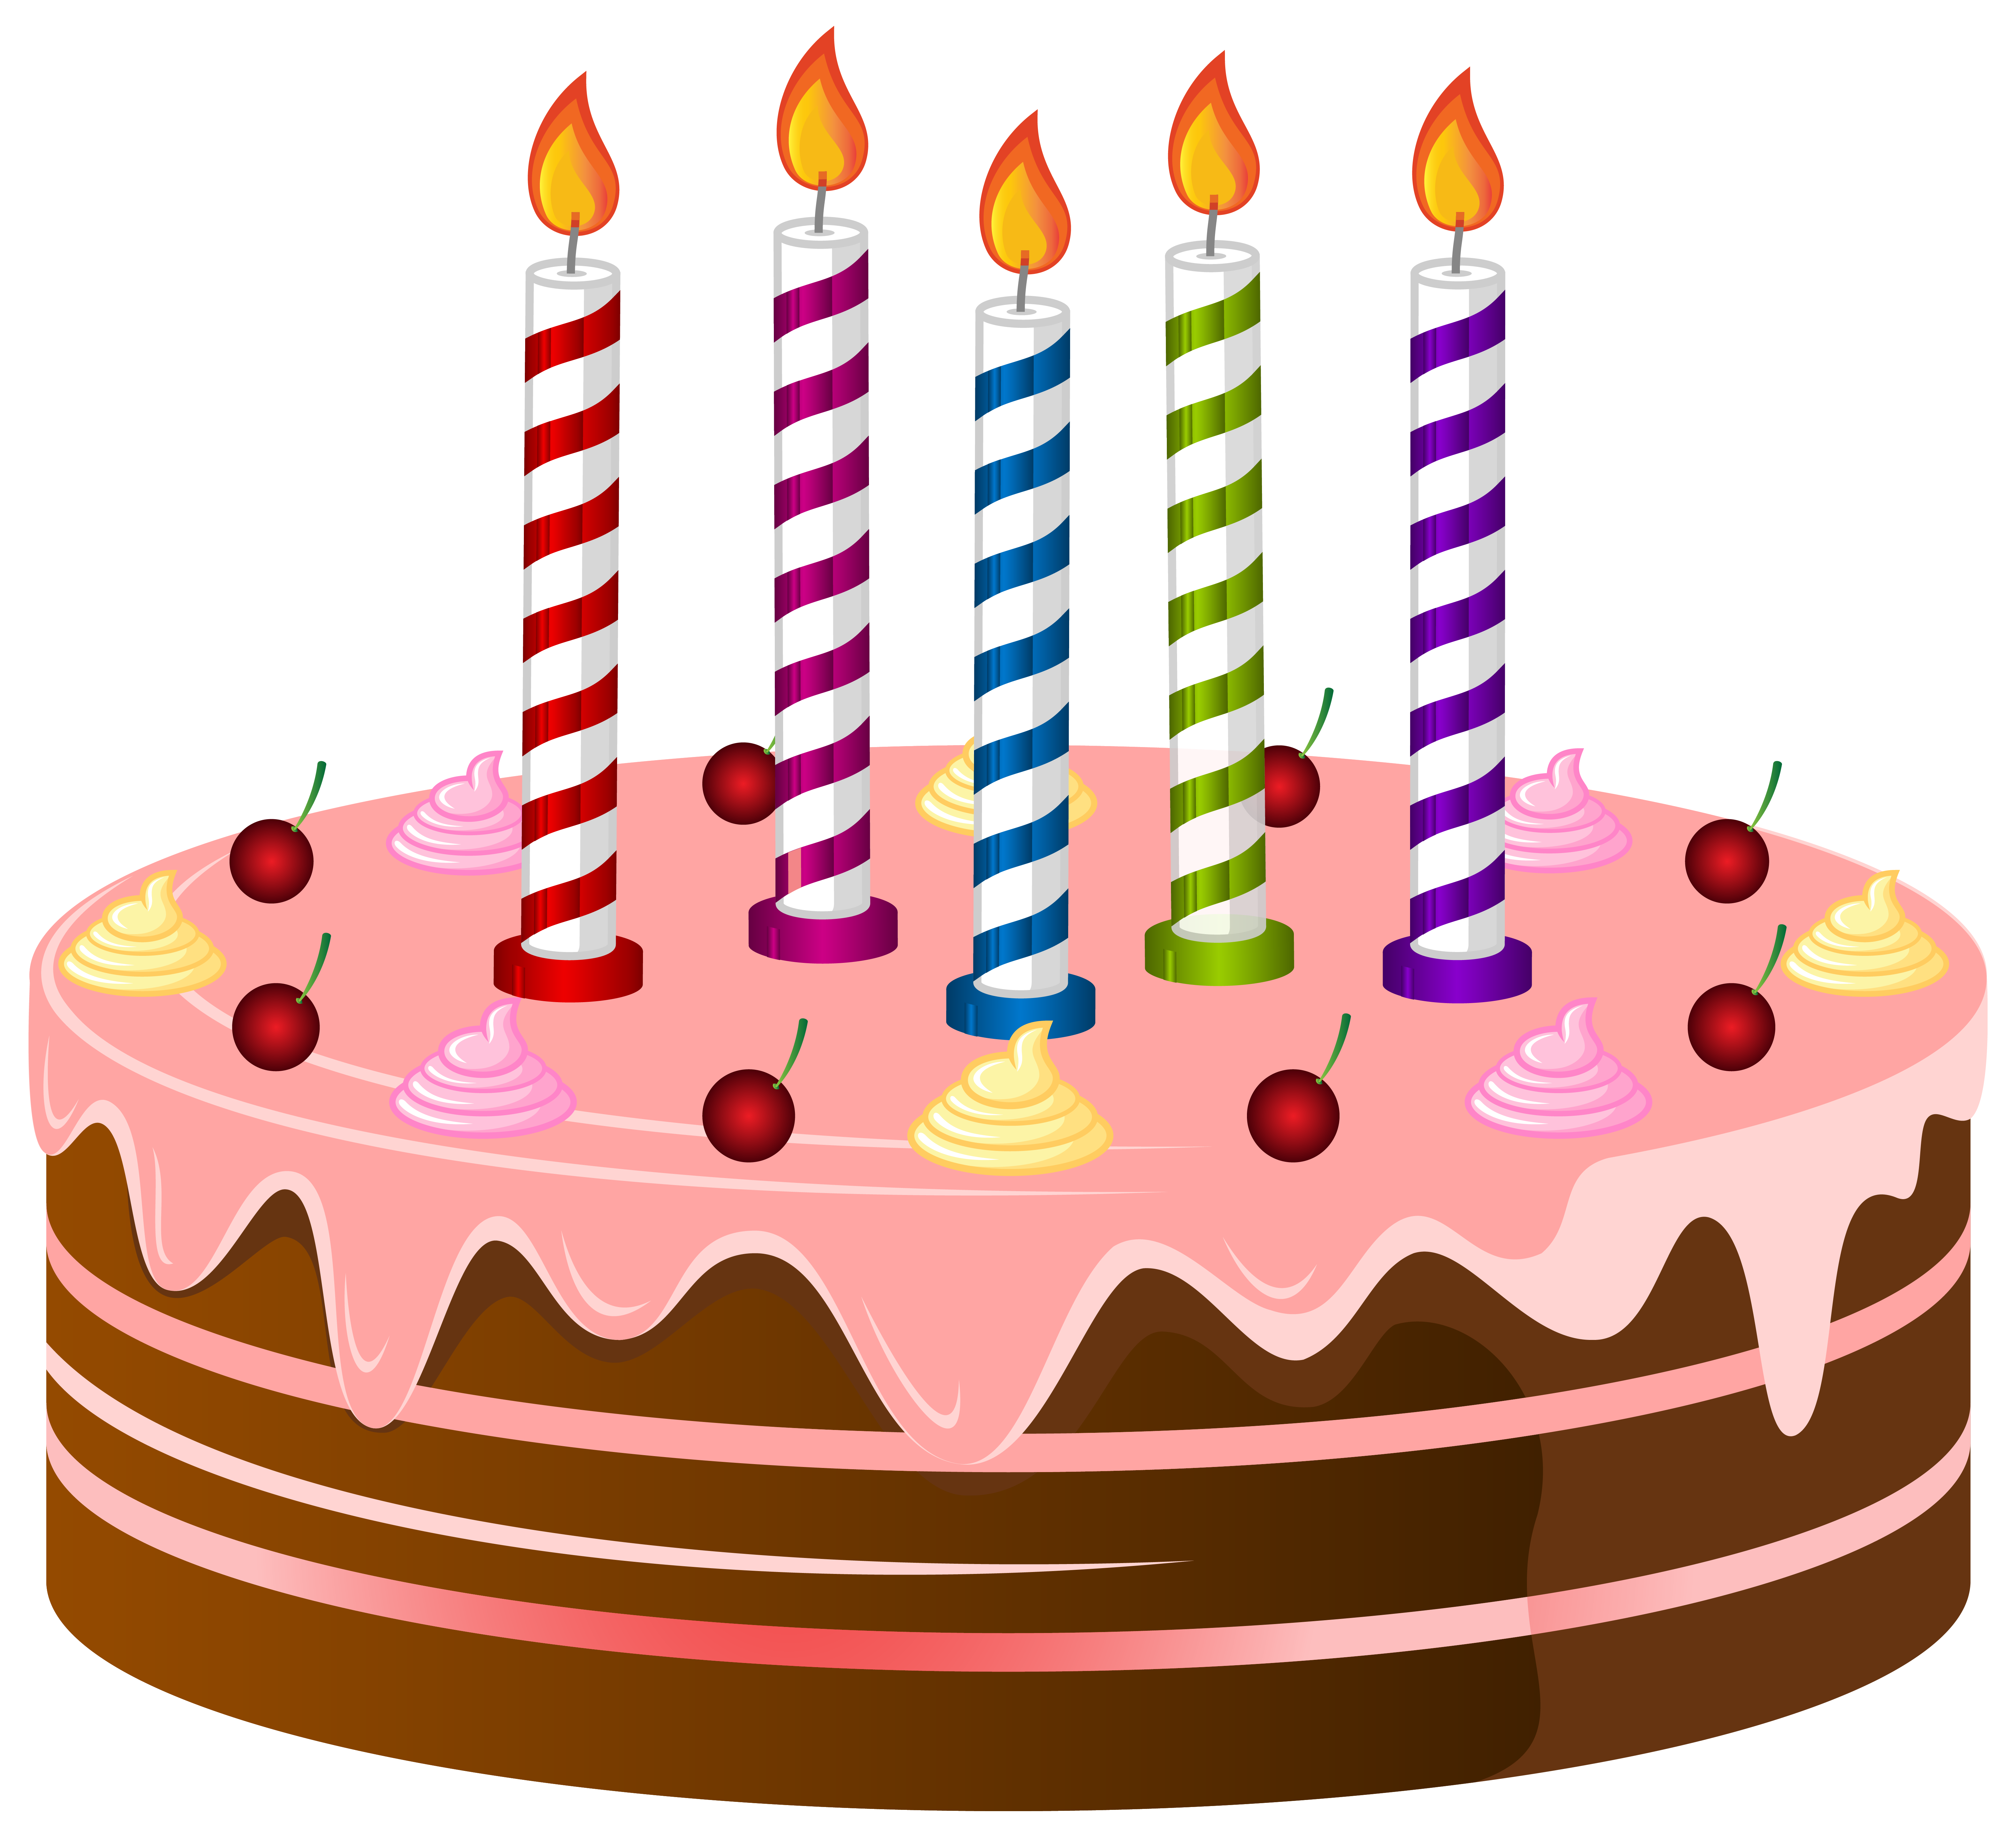 6315x5754 Free Birthday Cake Clip Art